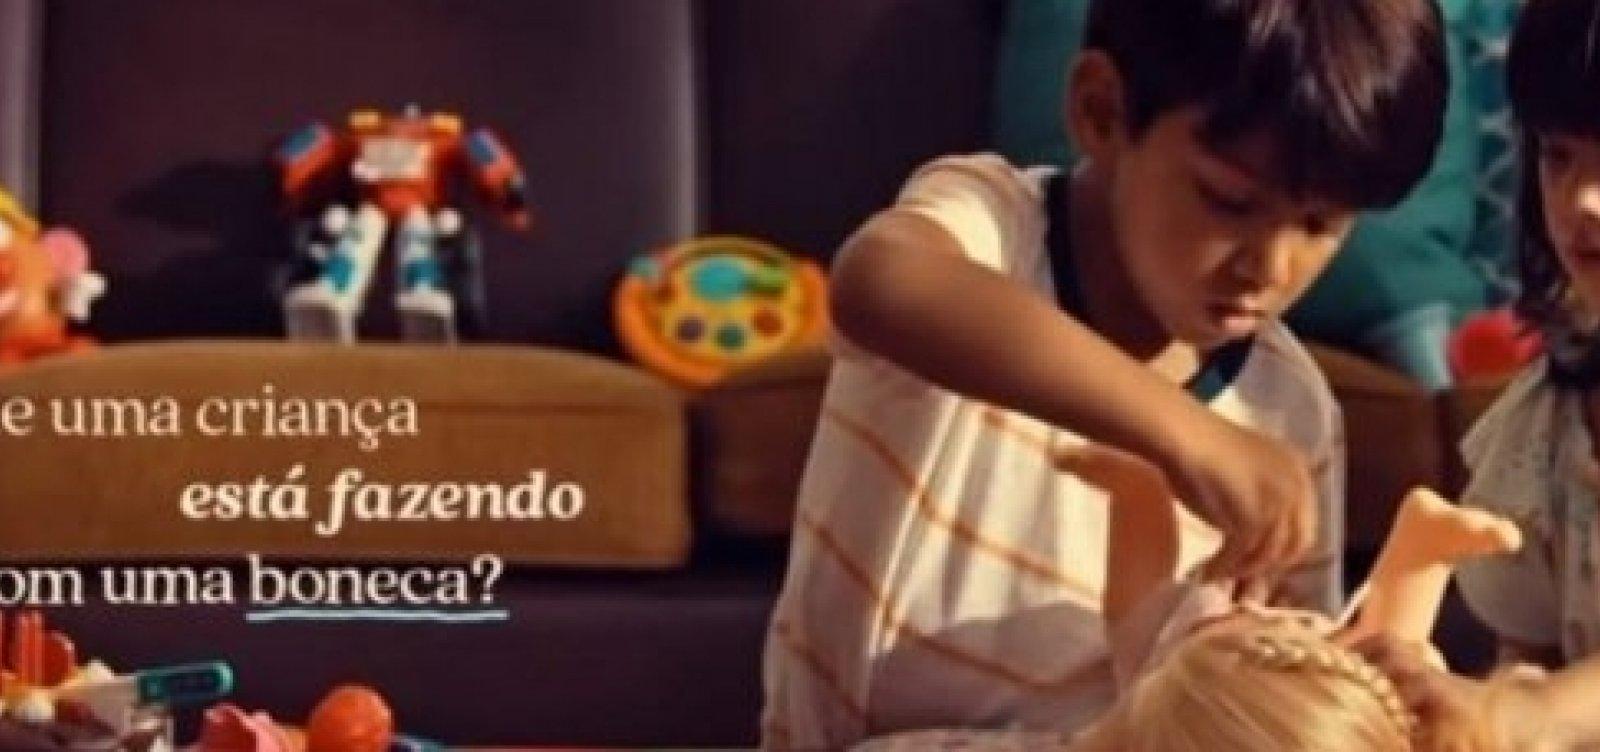 Comercial da Hasbro mostra que meninos podem brincar de boneca